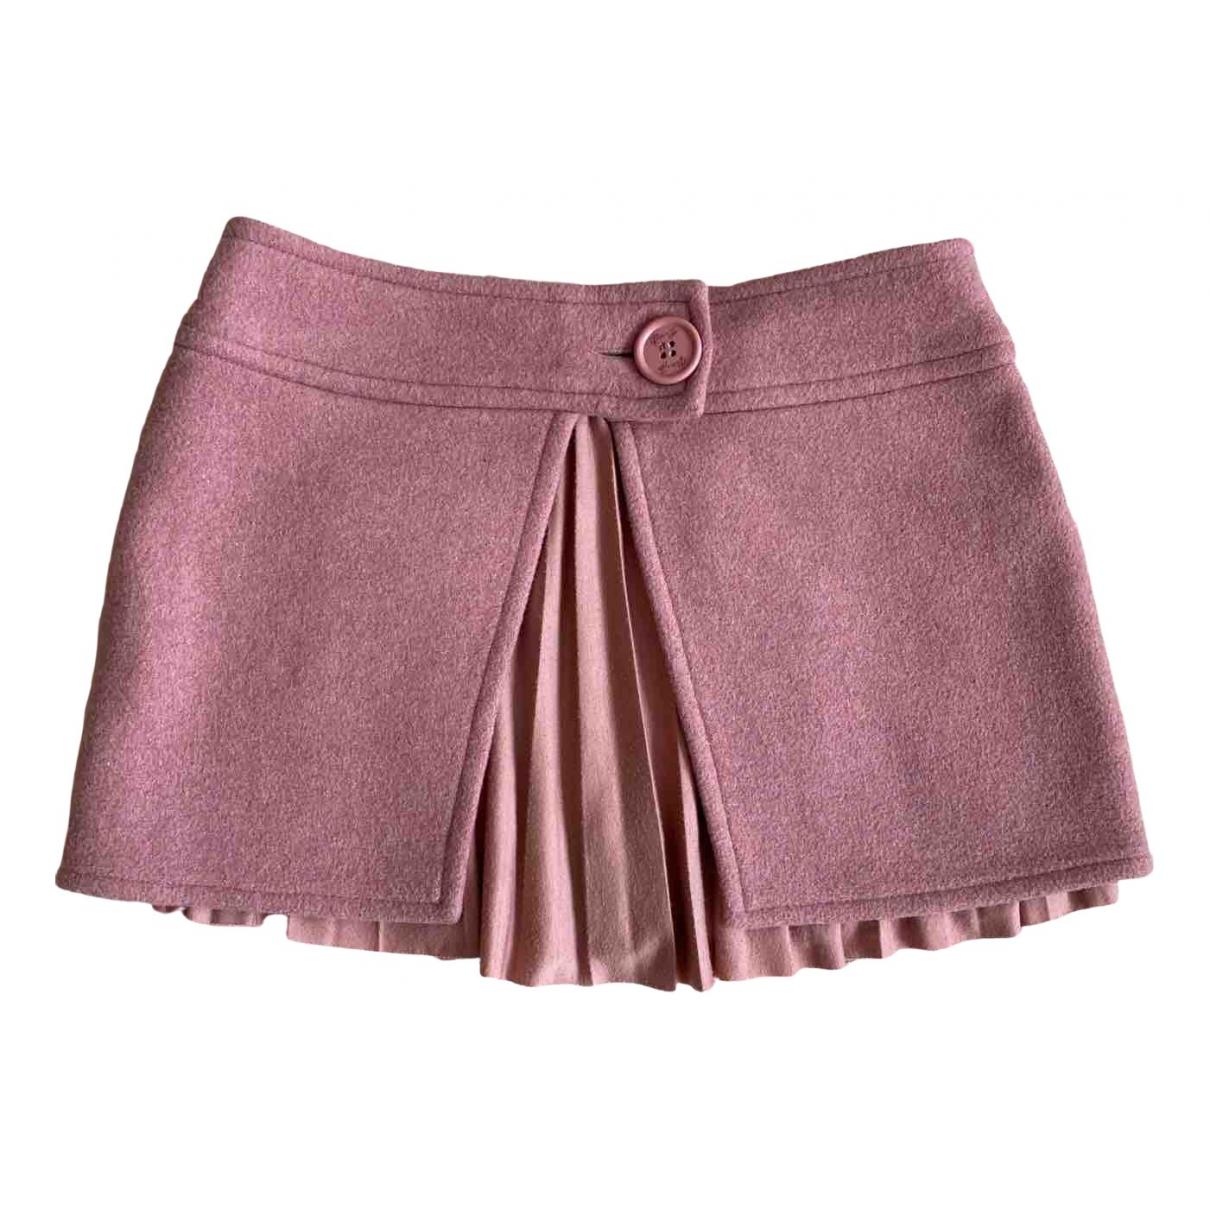 Mini falda de Lana Liu.jo